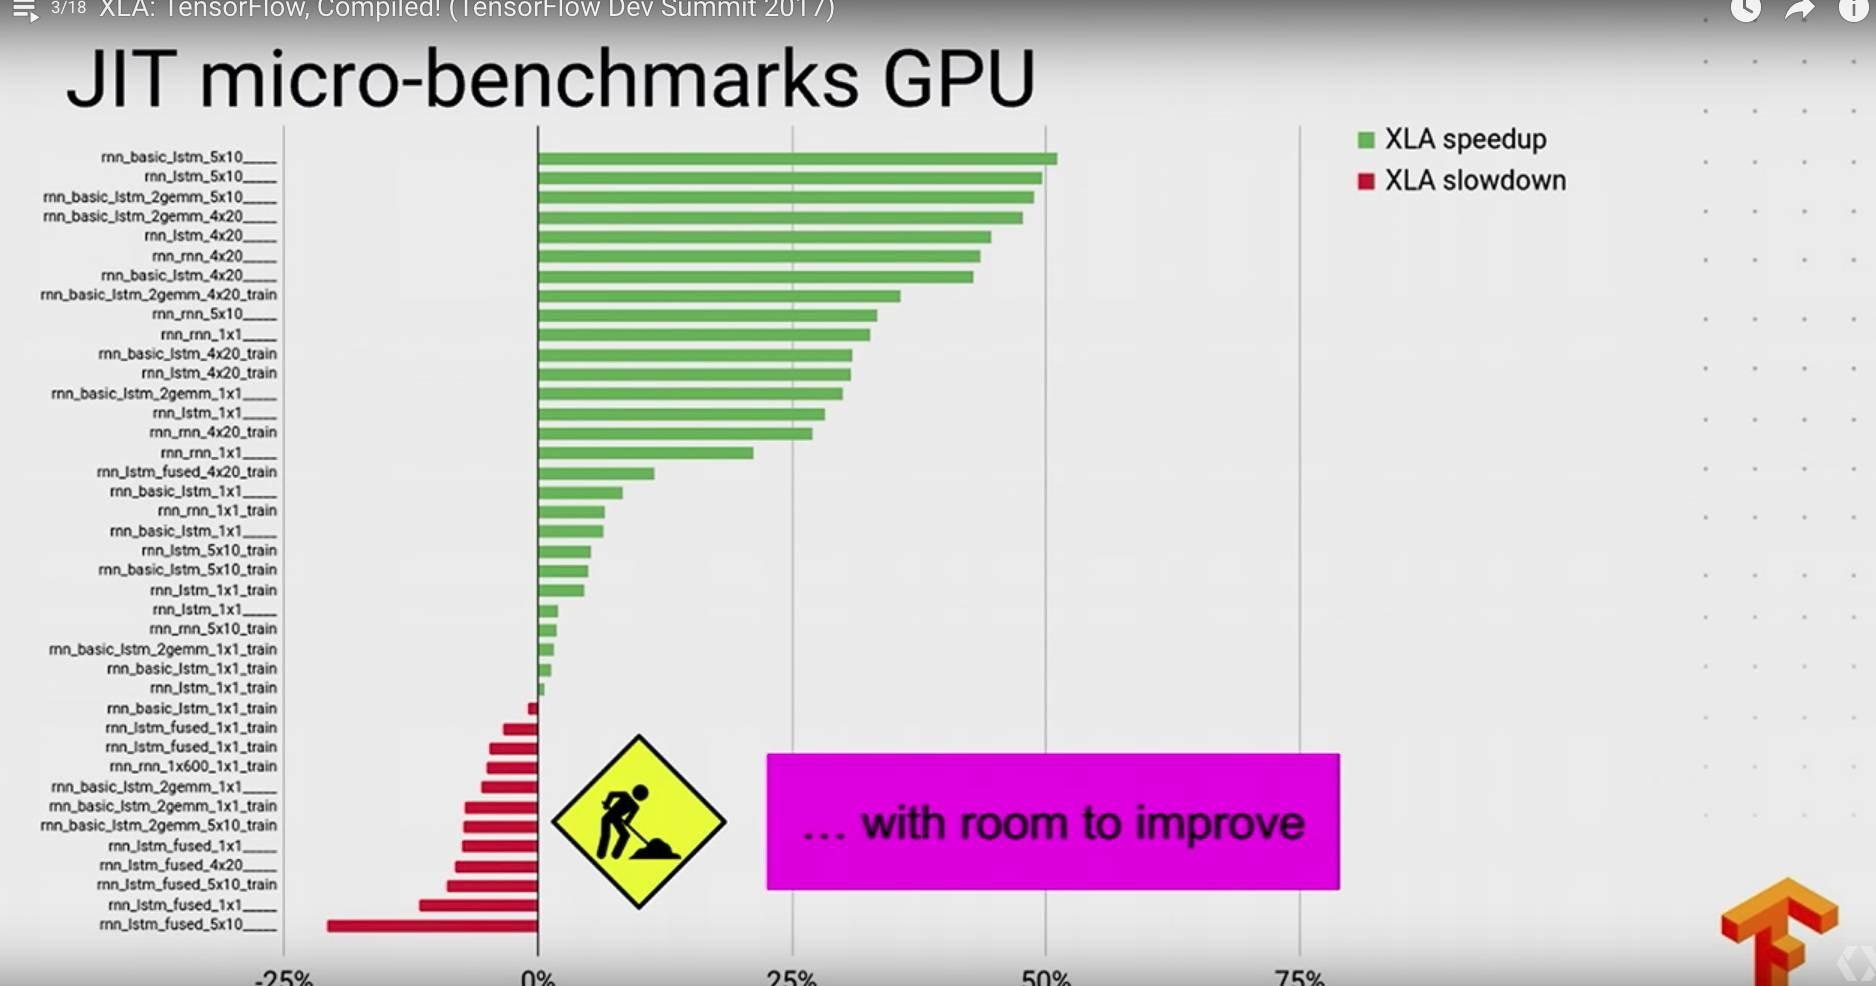 TensorFlow-dev-summit:那些TensorFlow上好玩的和黑科技_人工智能